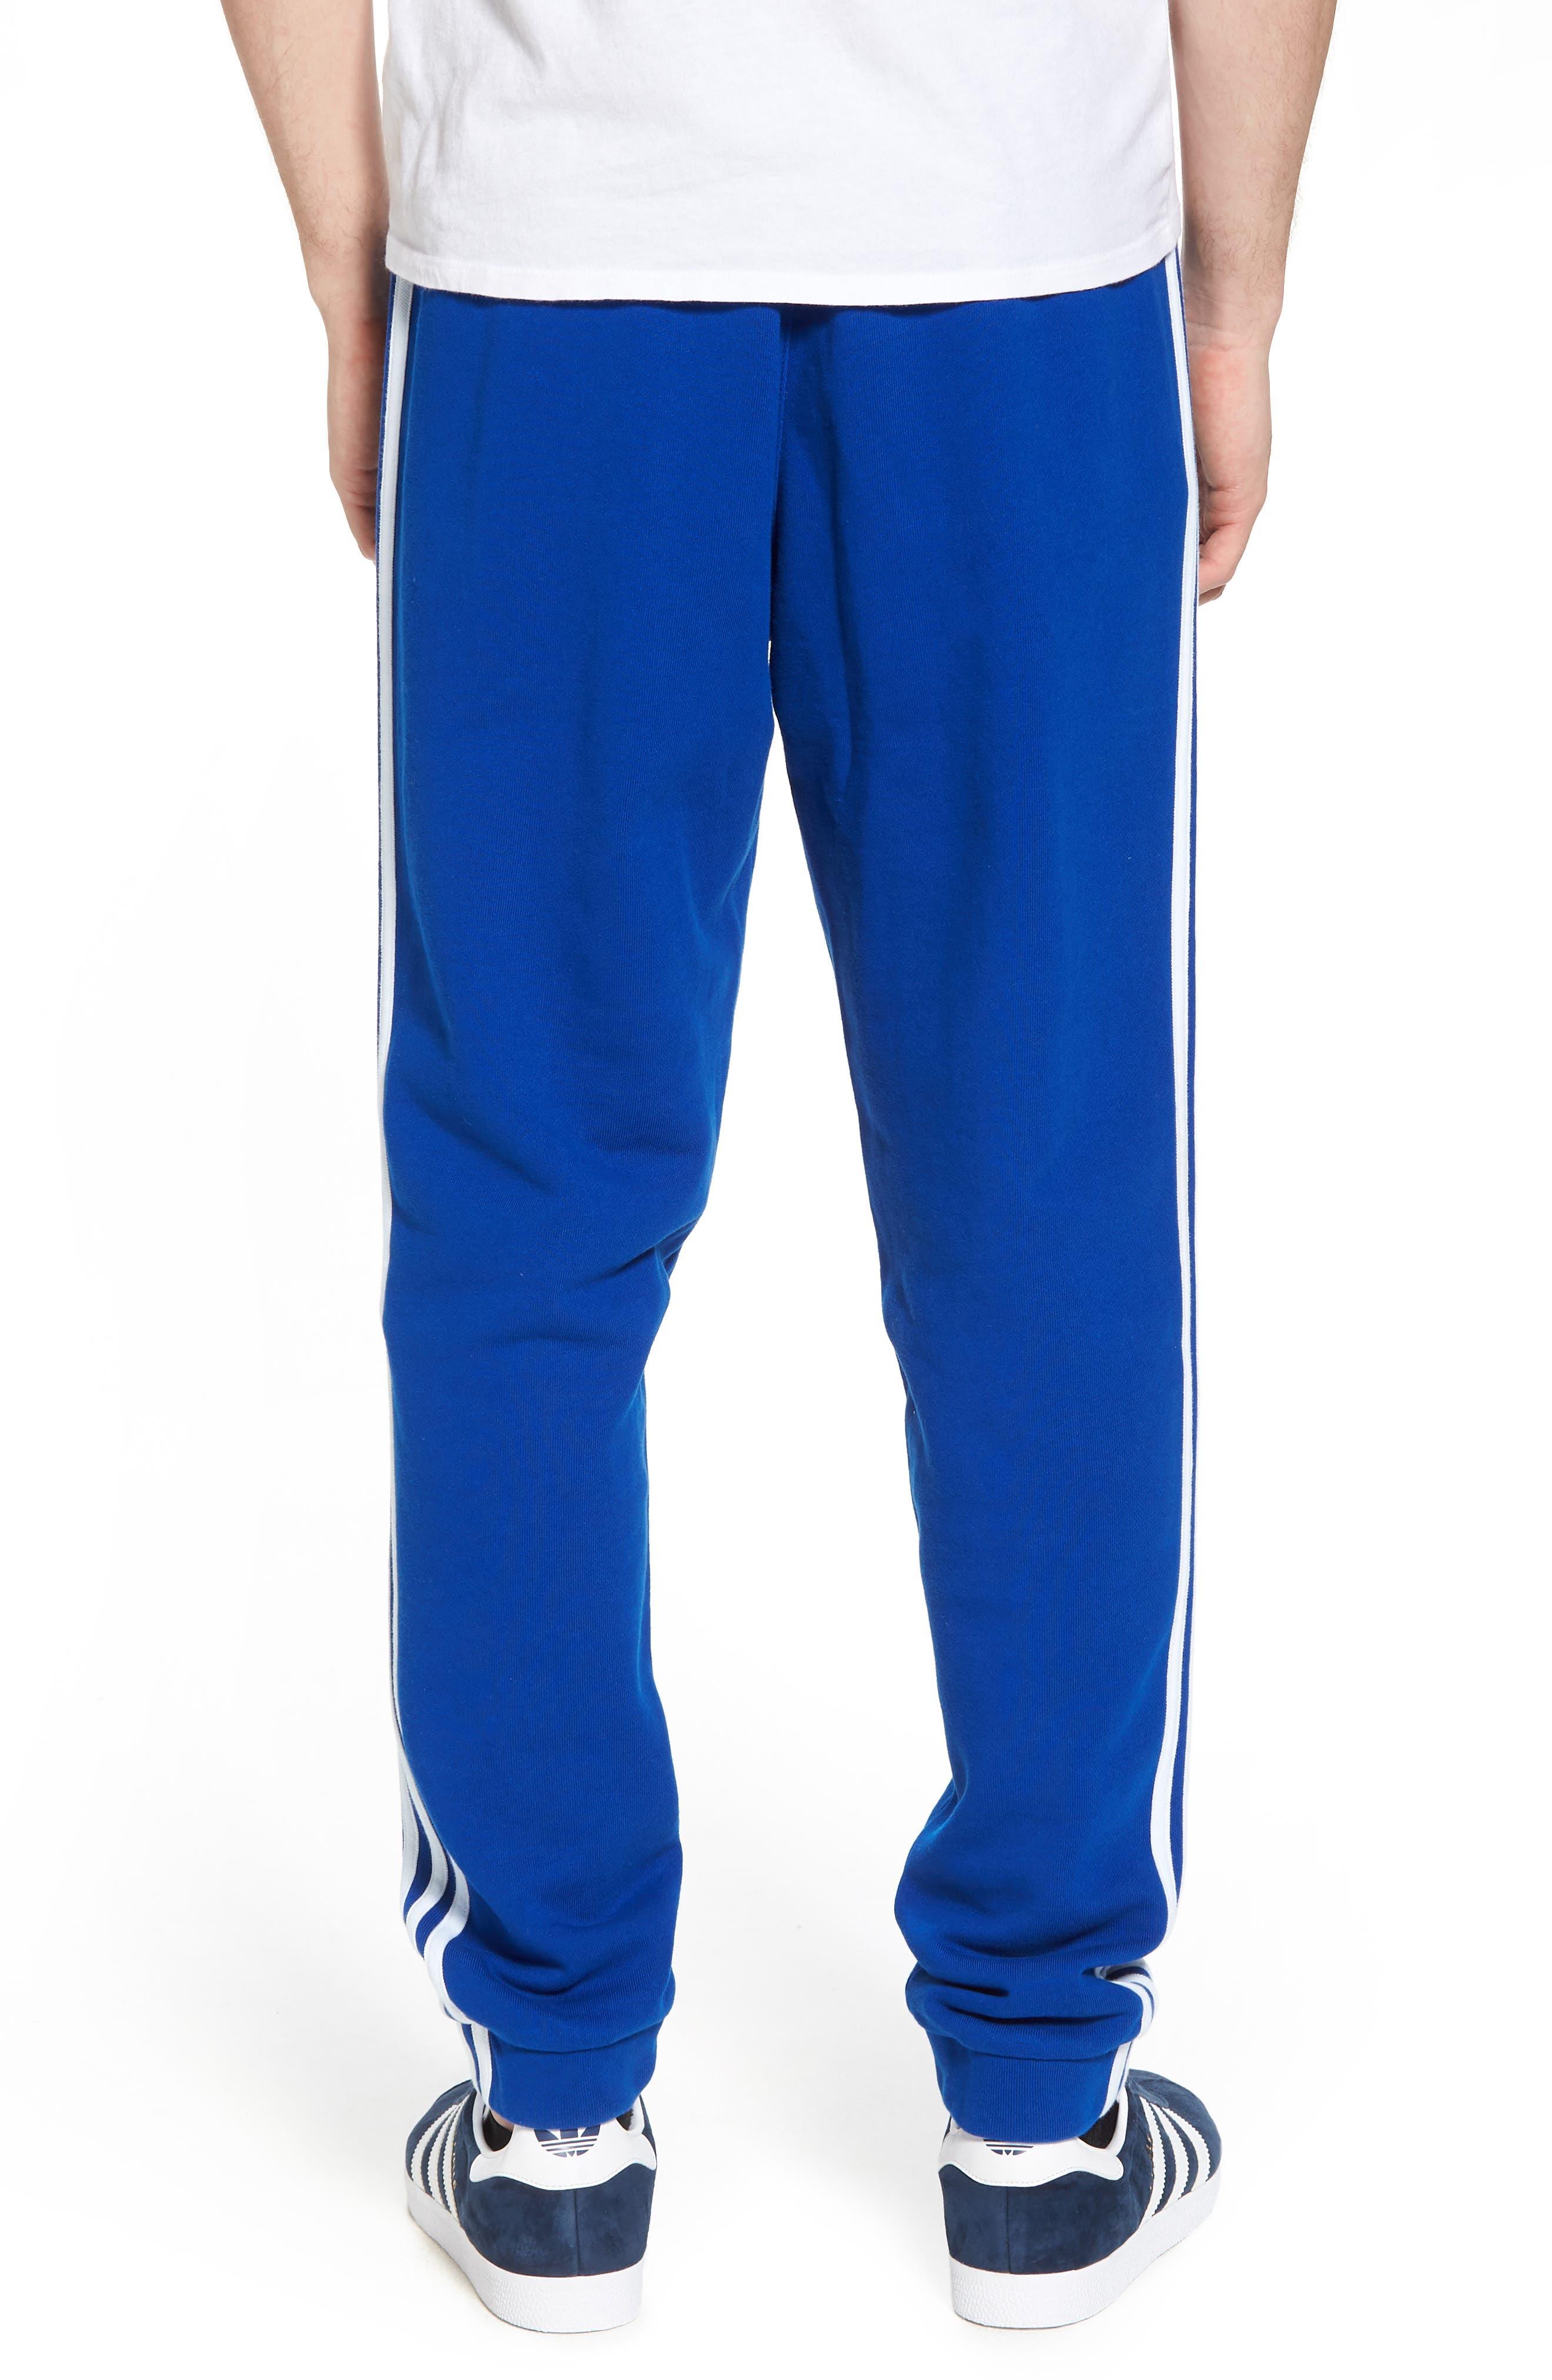 3-Stripes Sweatpants,                             Alternate thumbnail 2, color,                             Collegiate Royal